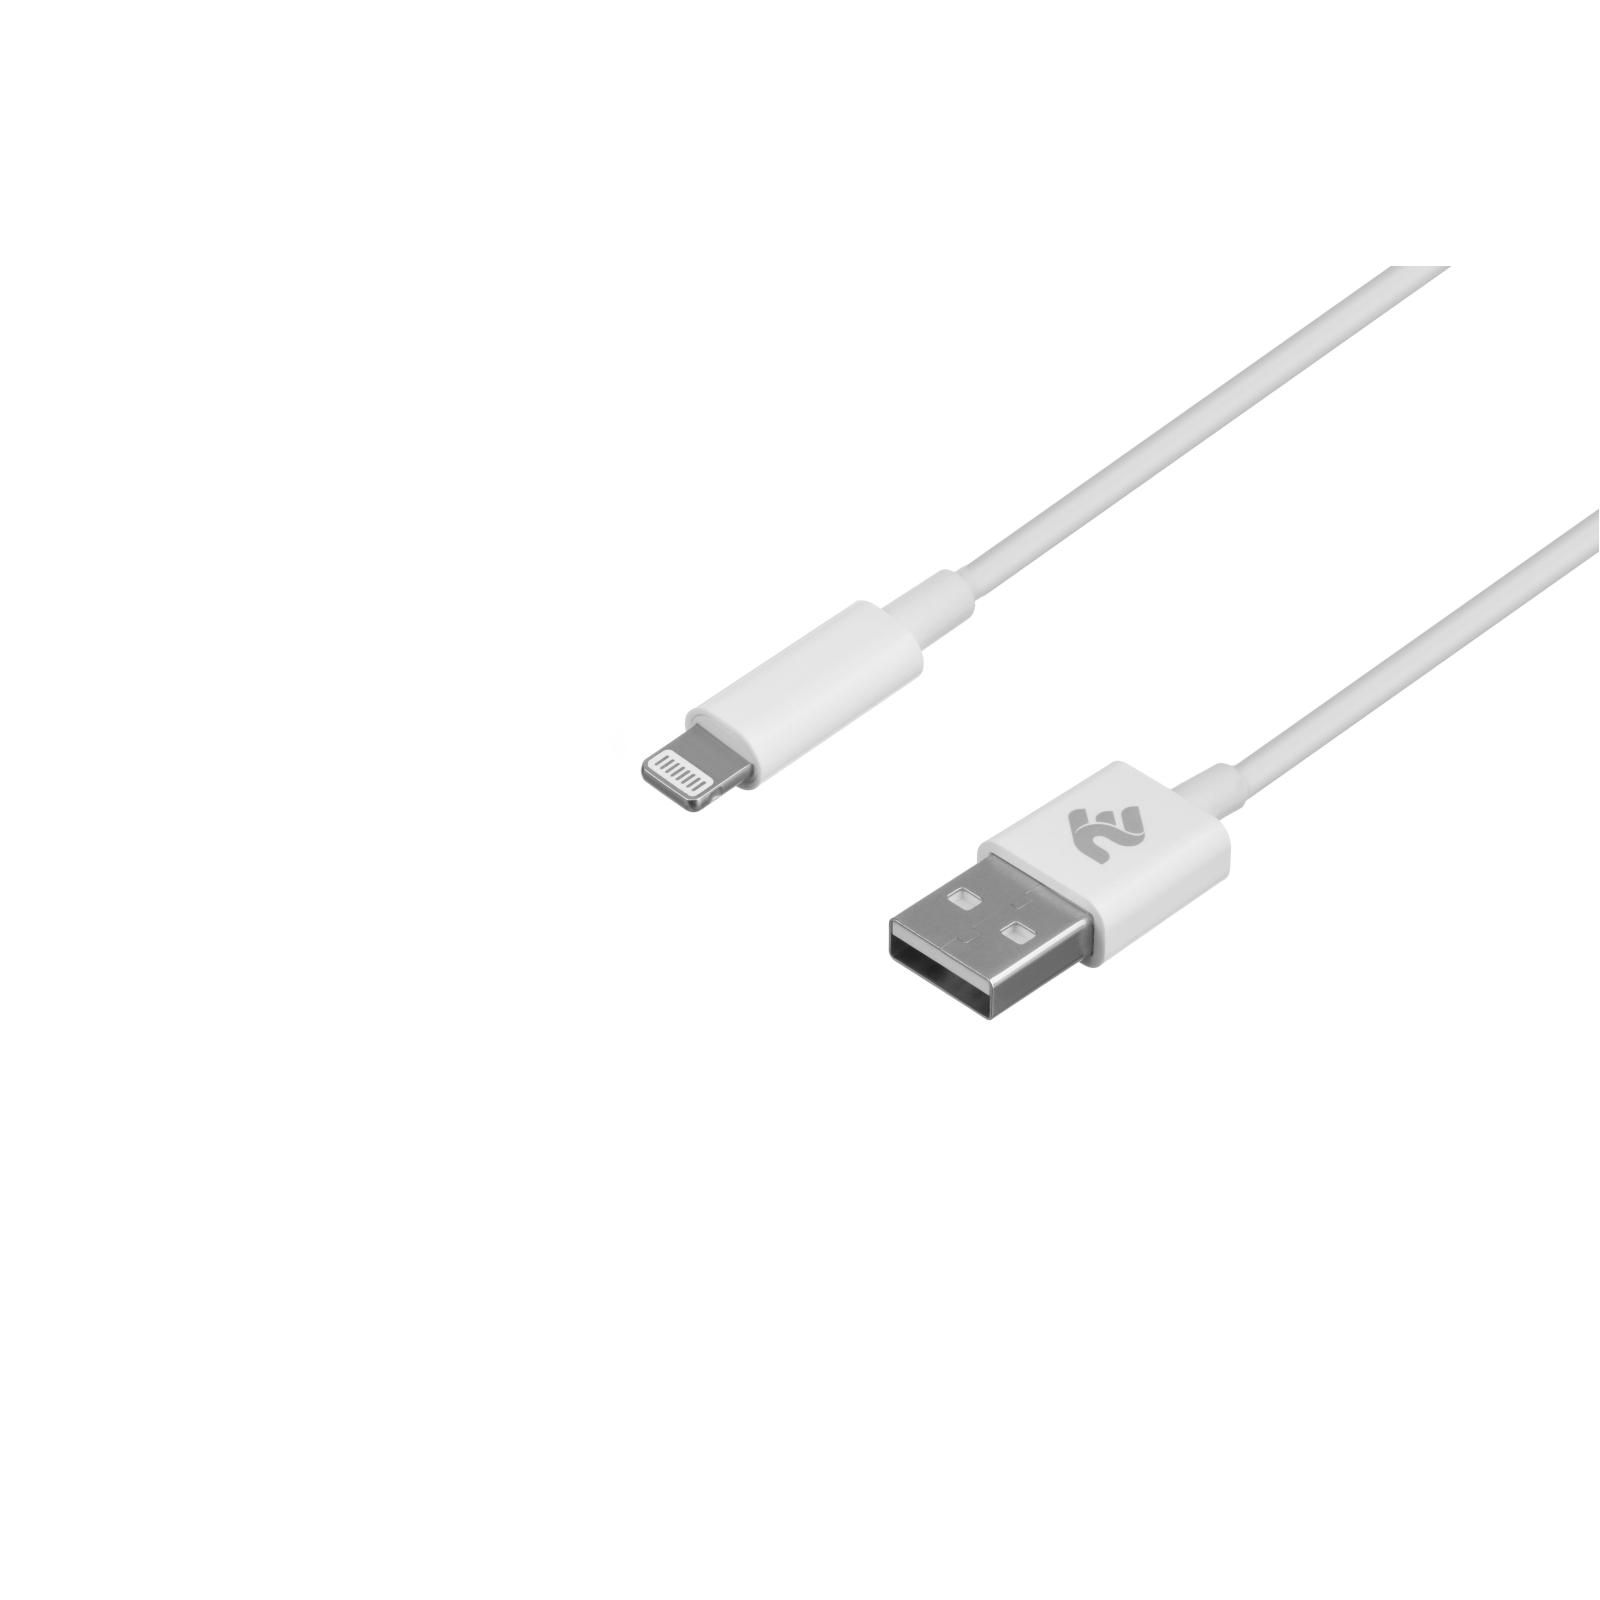 Дата кабель USB 2.0 AM to Lightning 1.0m 2.4A black 2E (2E-CCLAB-BL) изображение 2